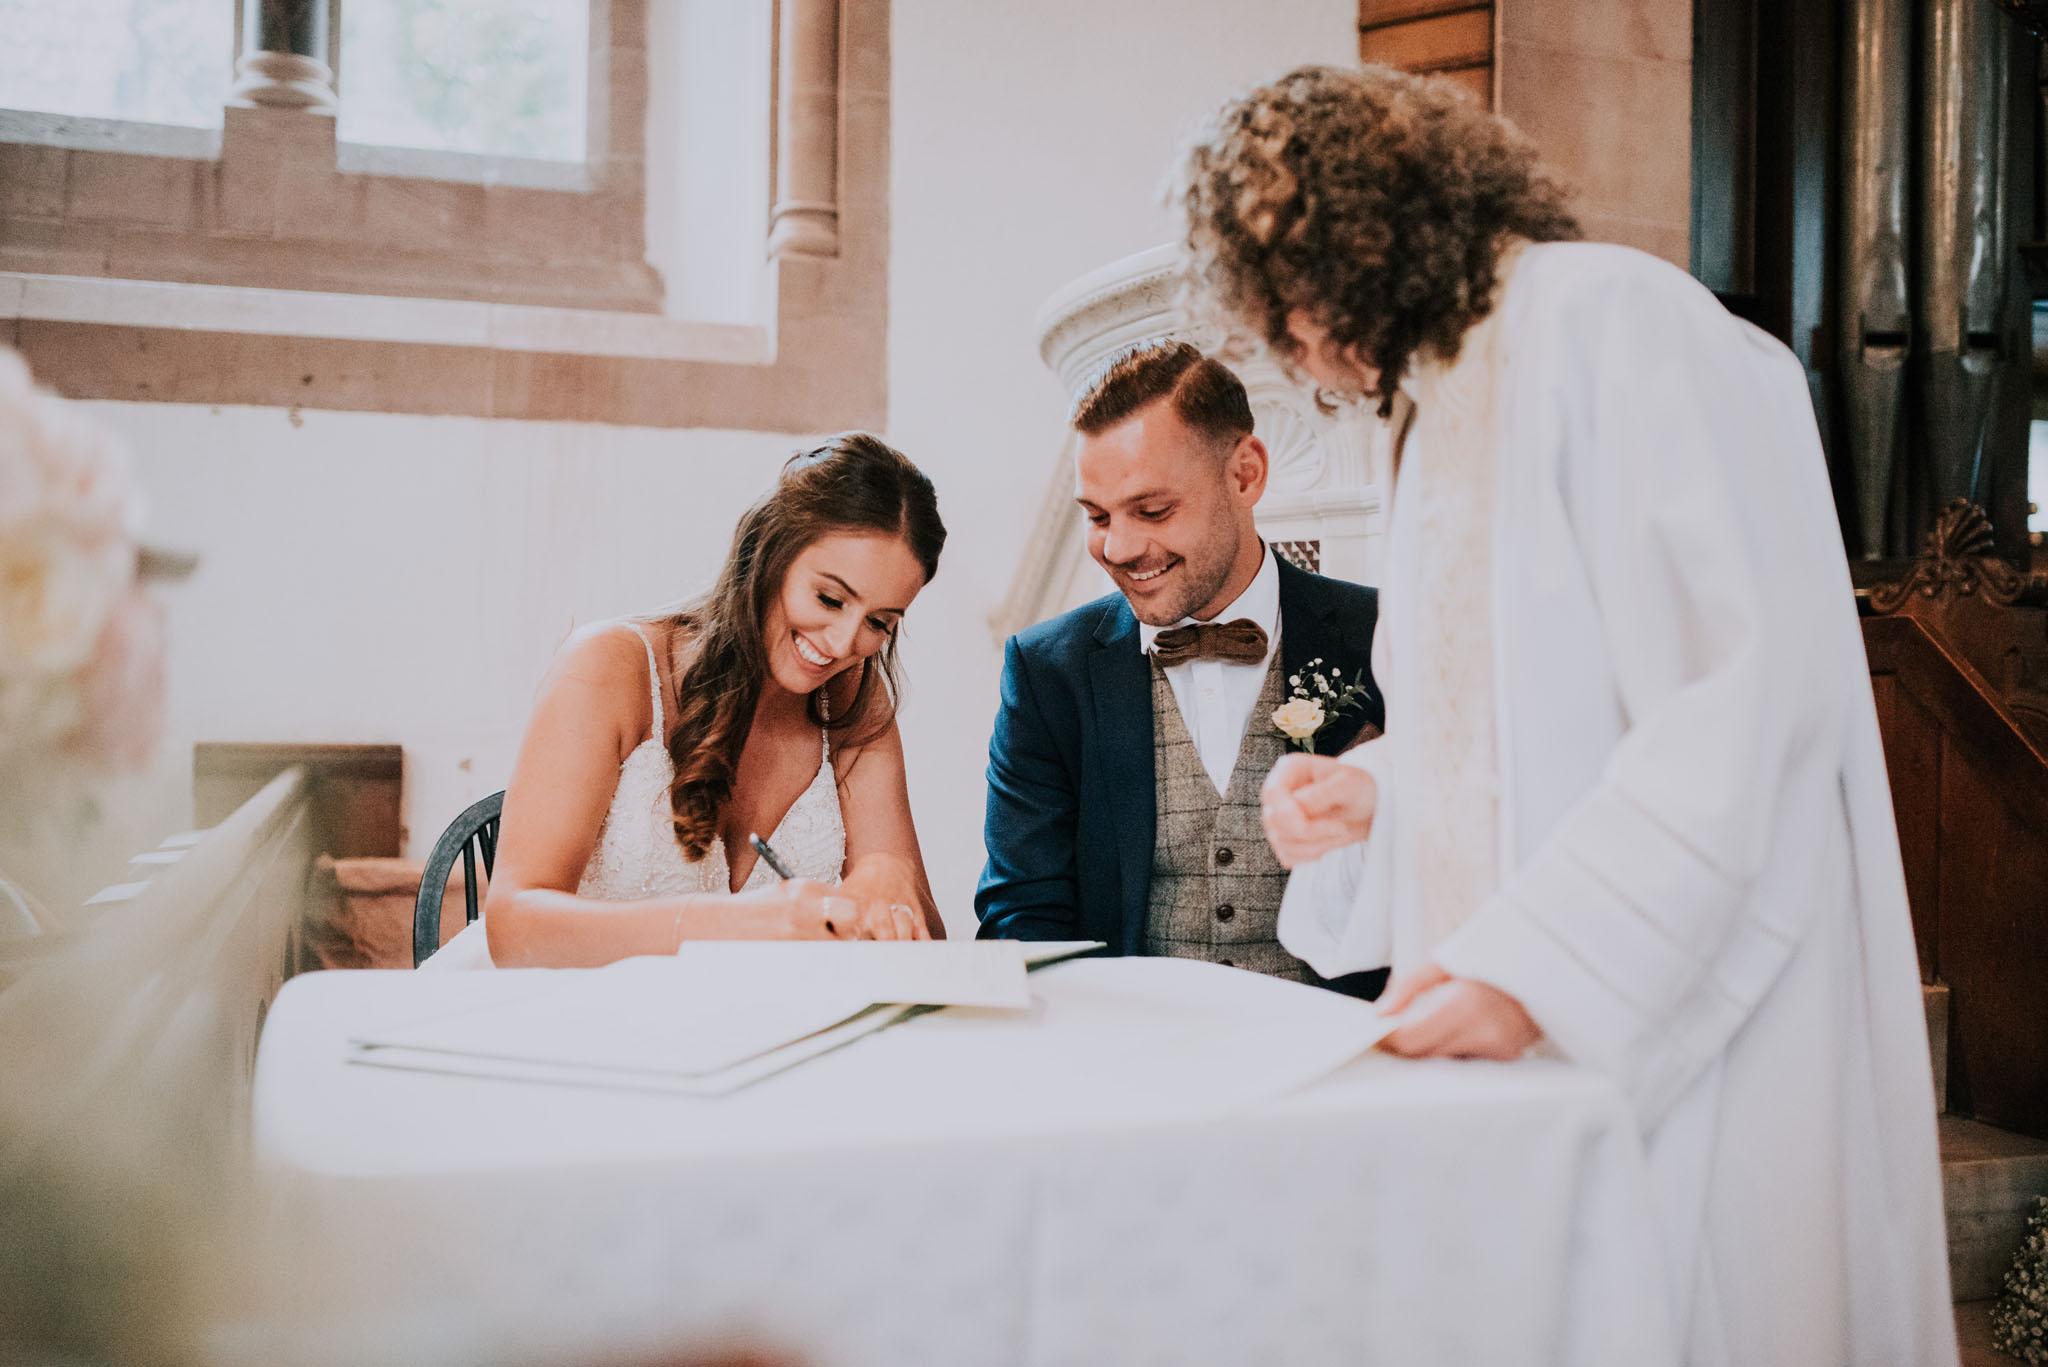 wedding-photographer-glewstone-court-hereford-scott-stockwell-photography203.jpg